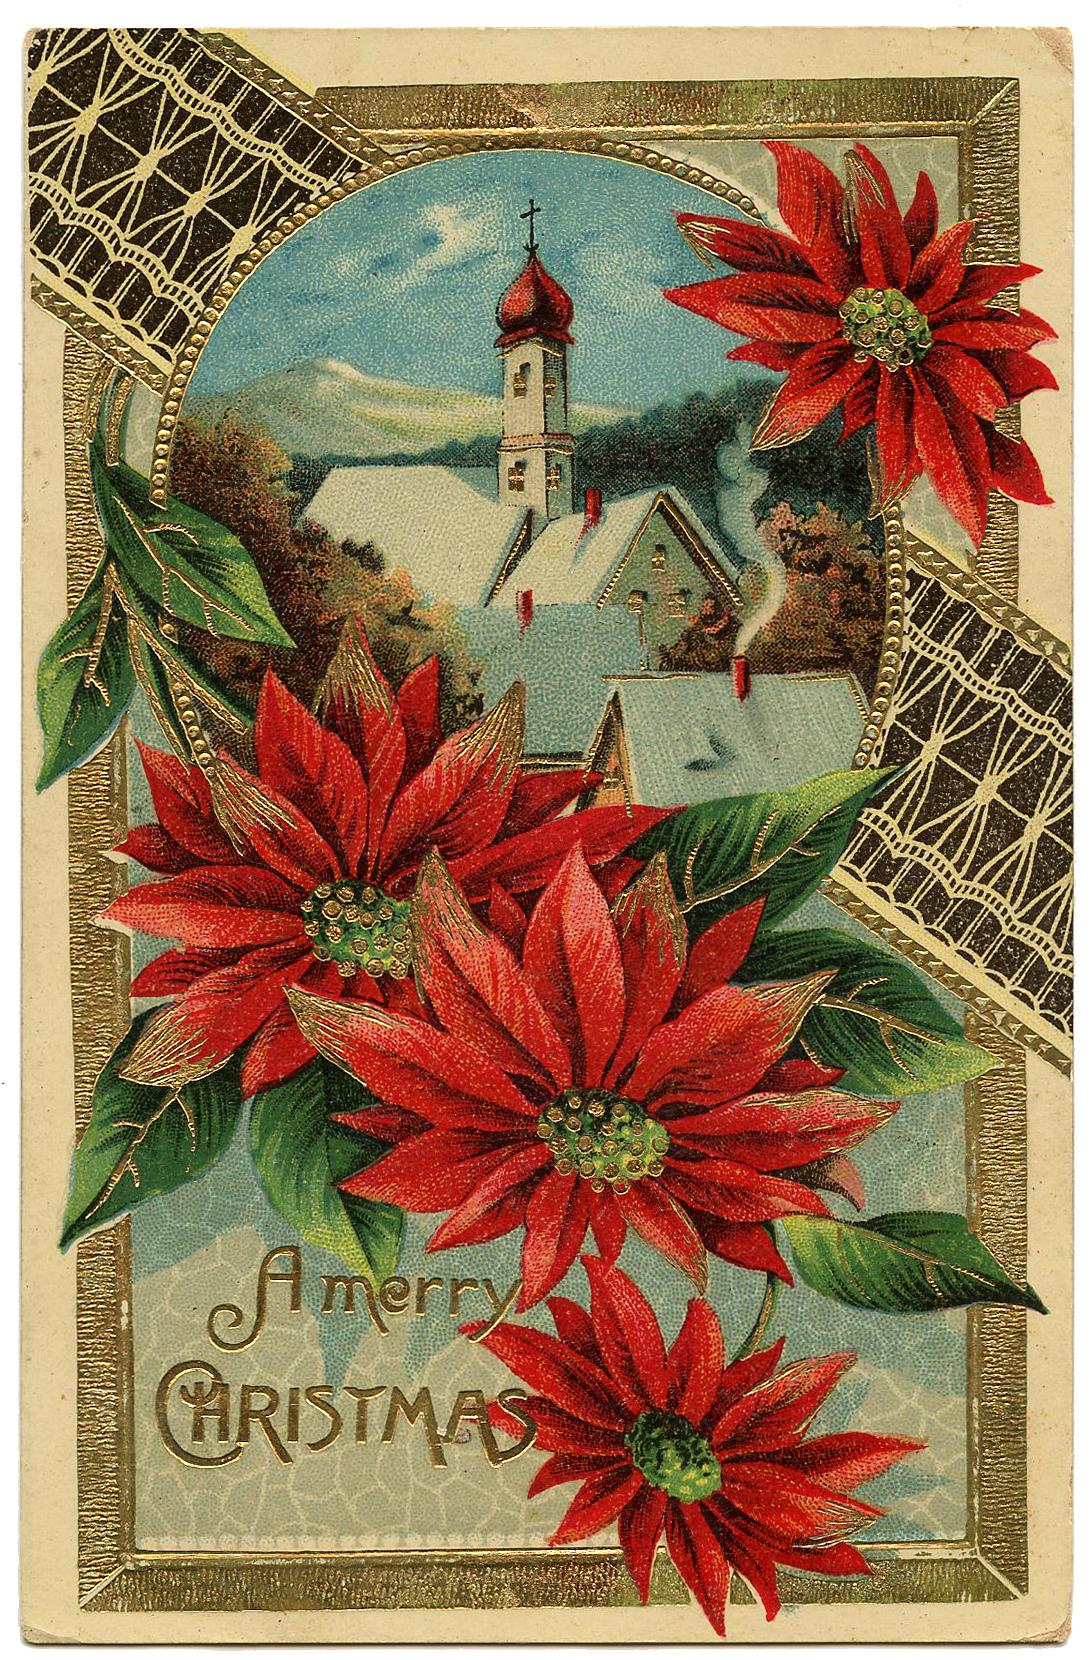 Poinsettia Church Christmas Image